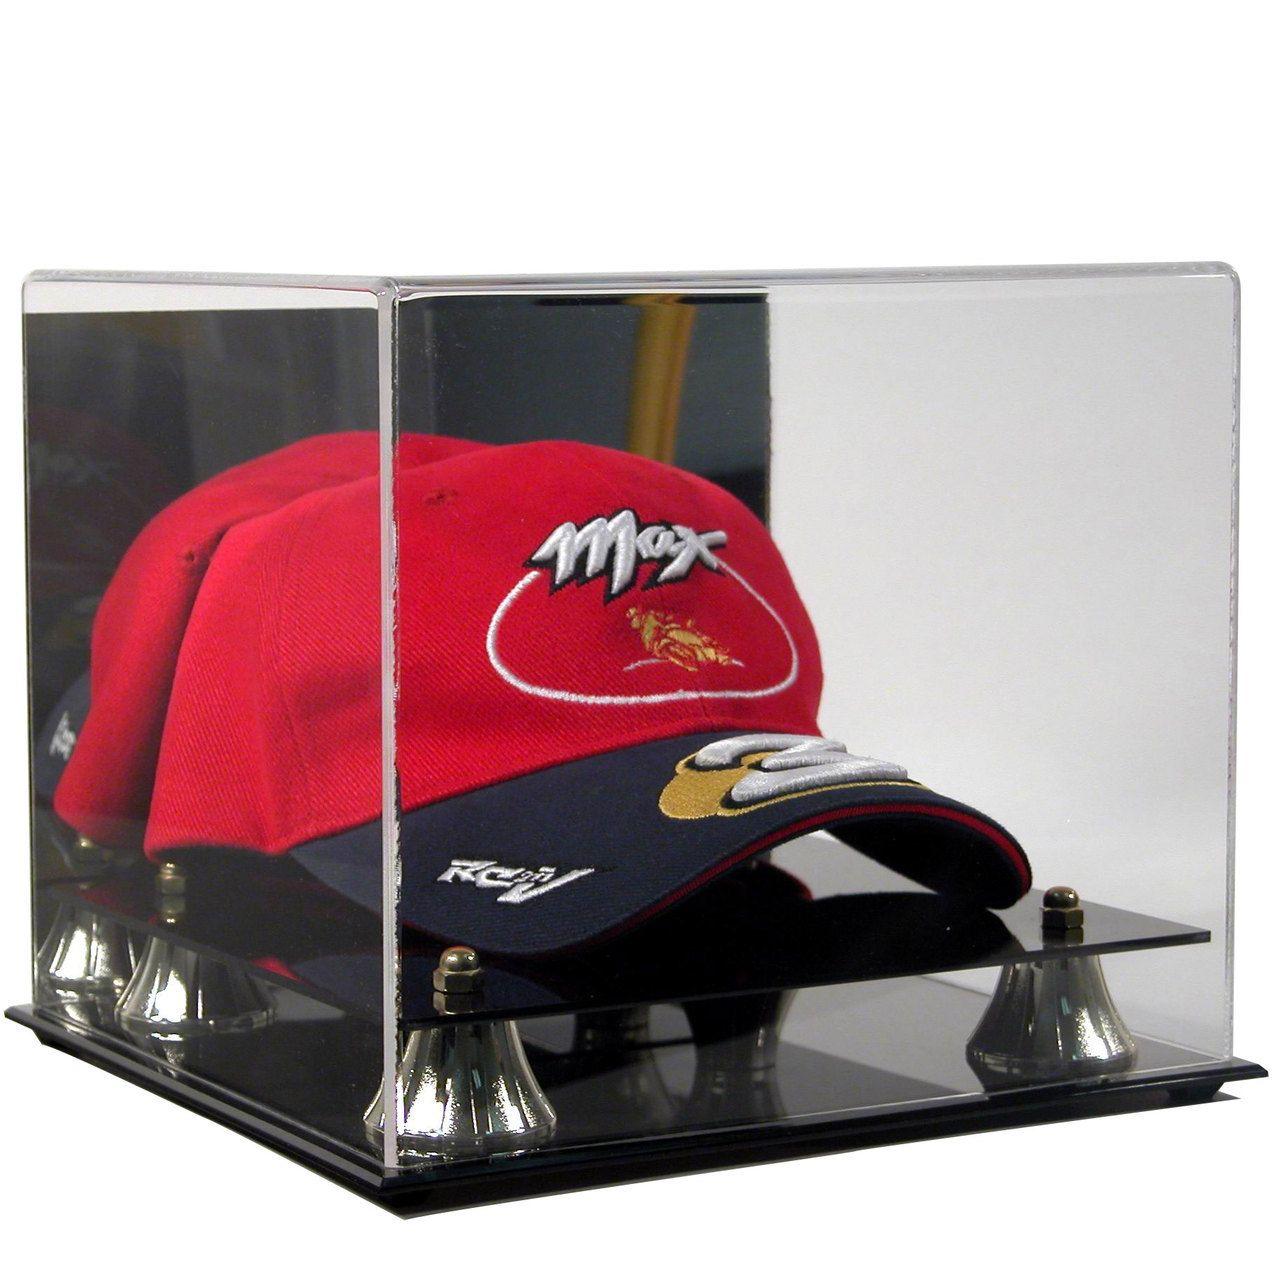 Mx6 Cap Display Case Hat Display Display Case Cap Display